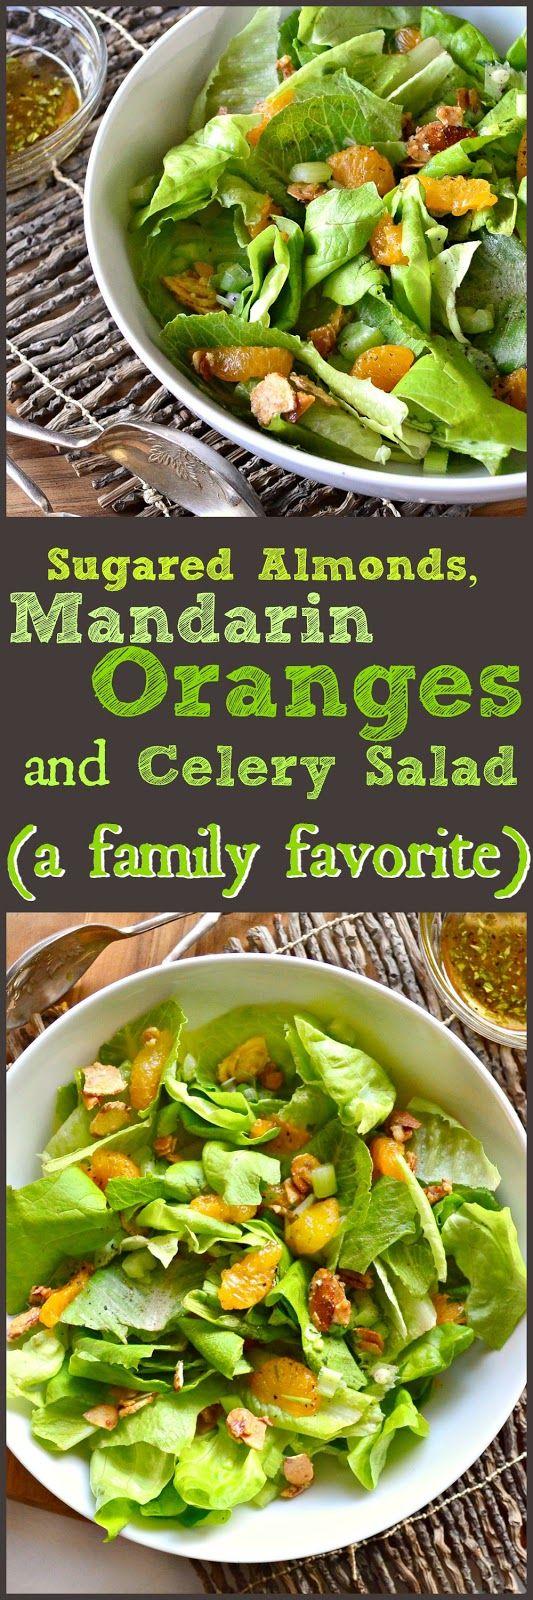 Sugared Almonds and Mandarin Orange, Green Salad | Recipe ...